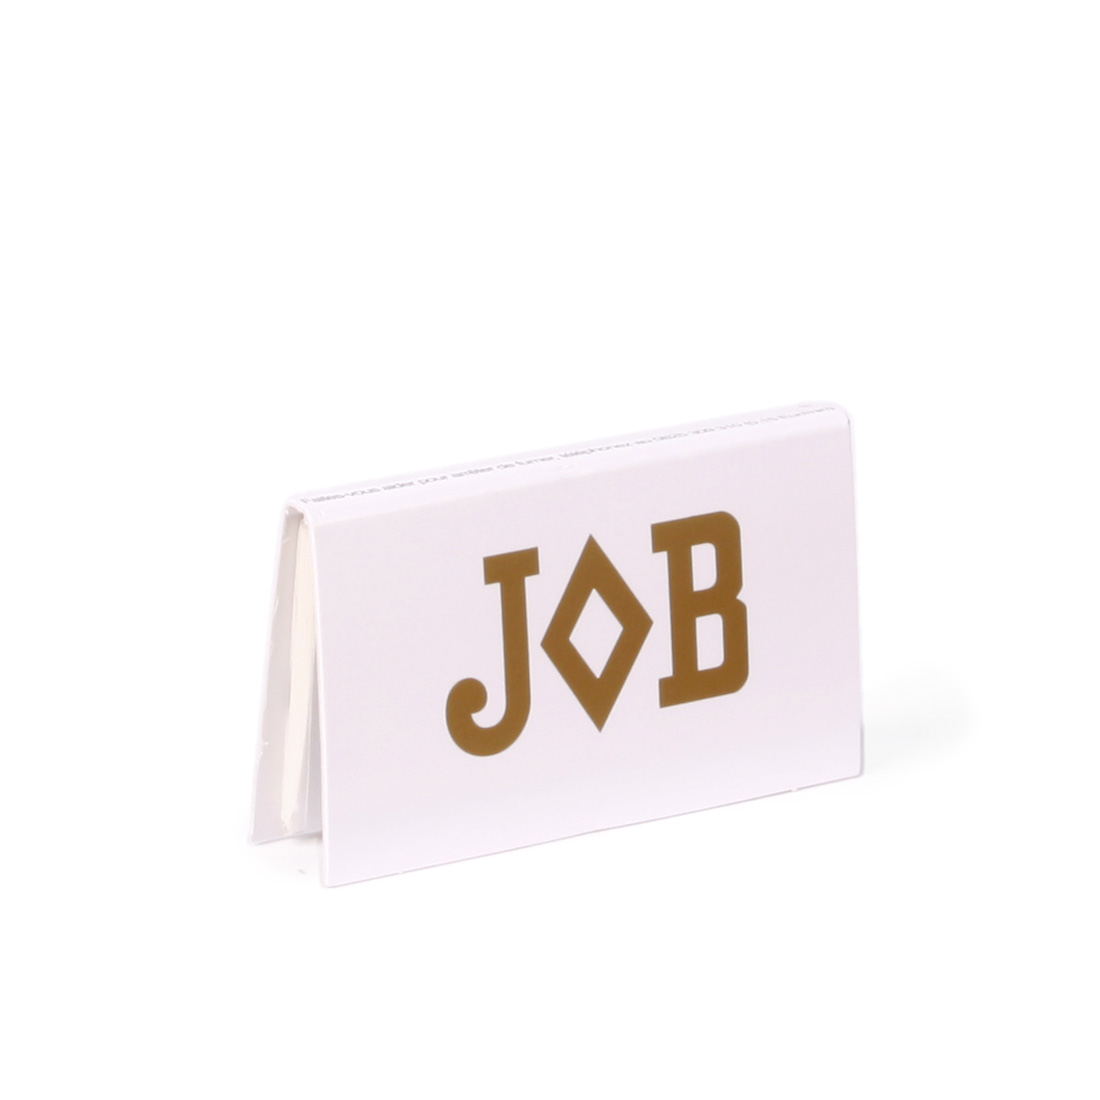 Job_bis